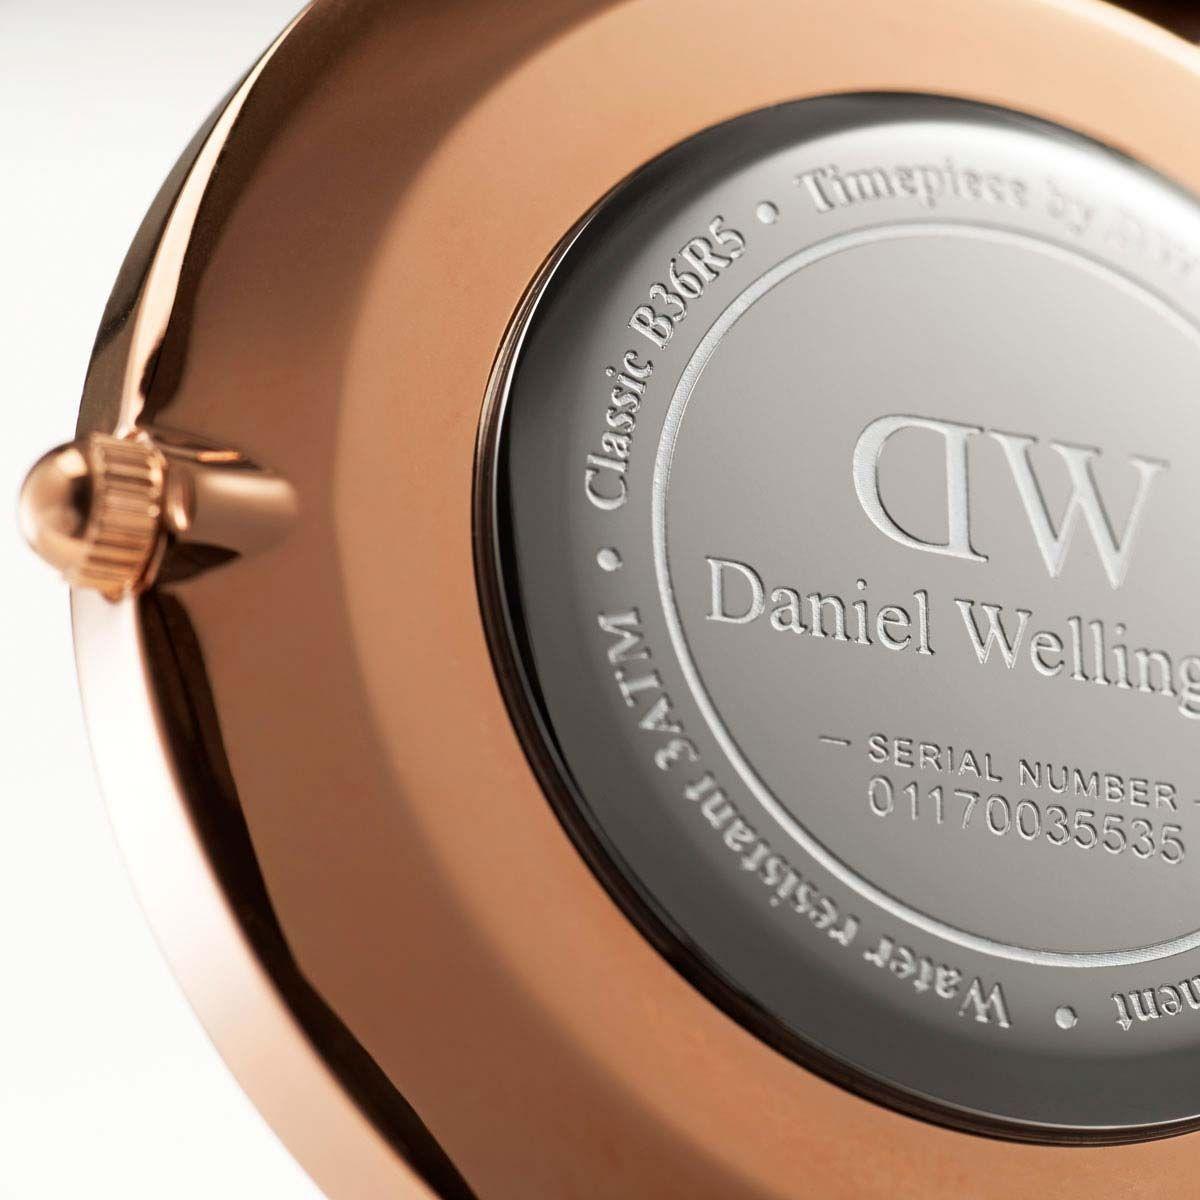 dw官网 dw手表官网 dw中国官网 dw官方旗舰店 DW DW官网  W Classic Black Sheffield RG 36mm